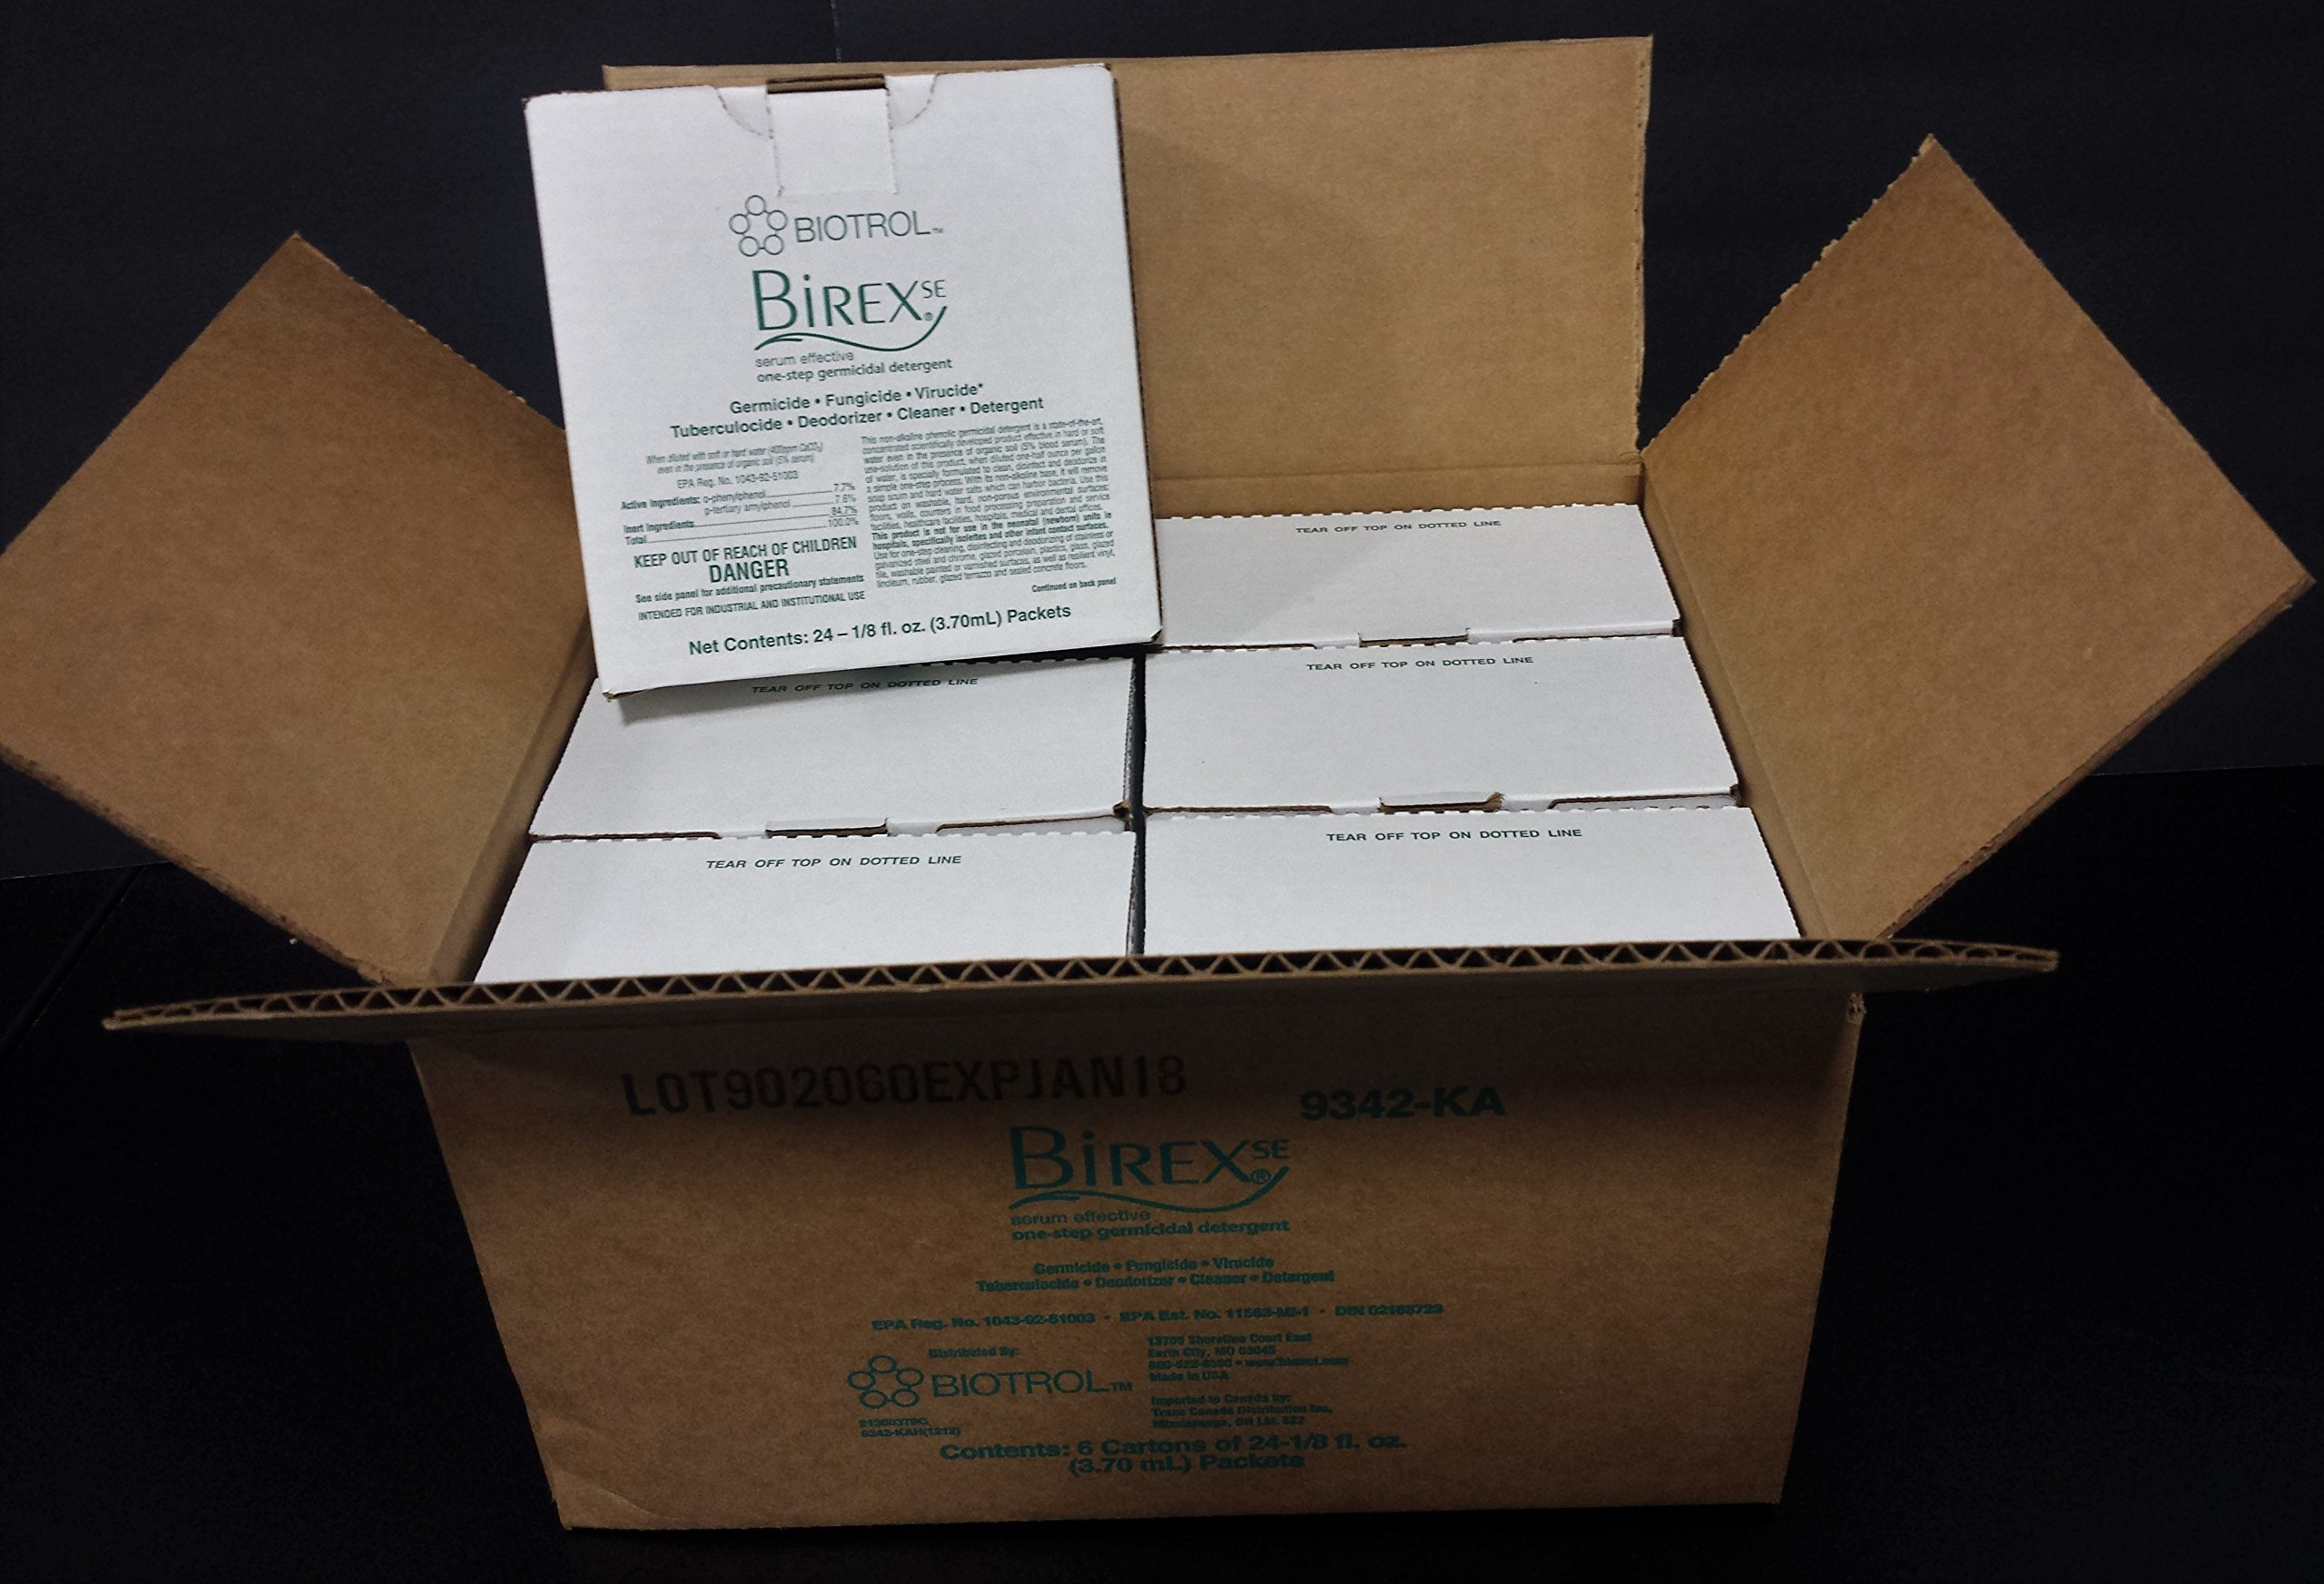 BIREX se Clinic Pack 144 1/8 oz Packets Makes 144 32oz Bottles